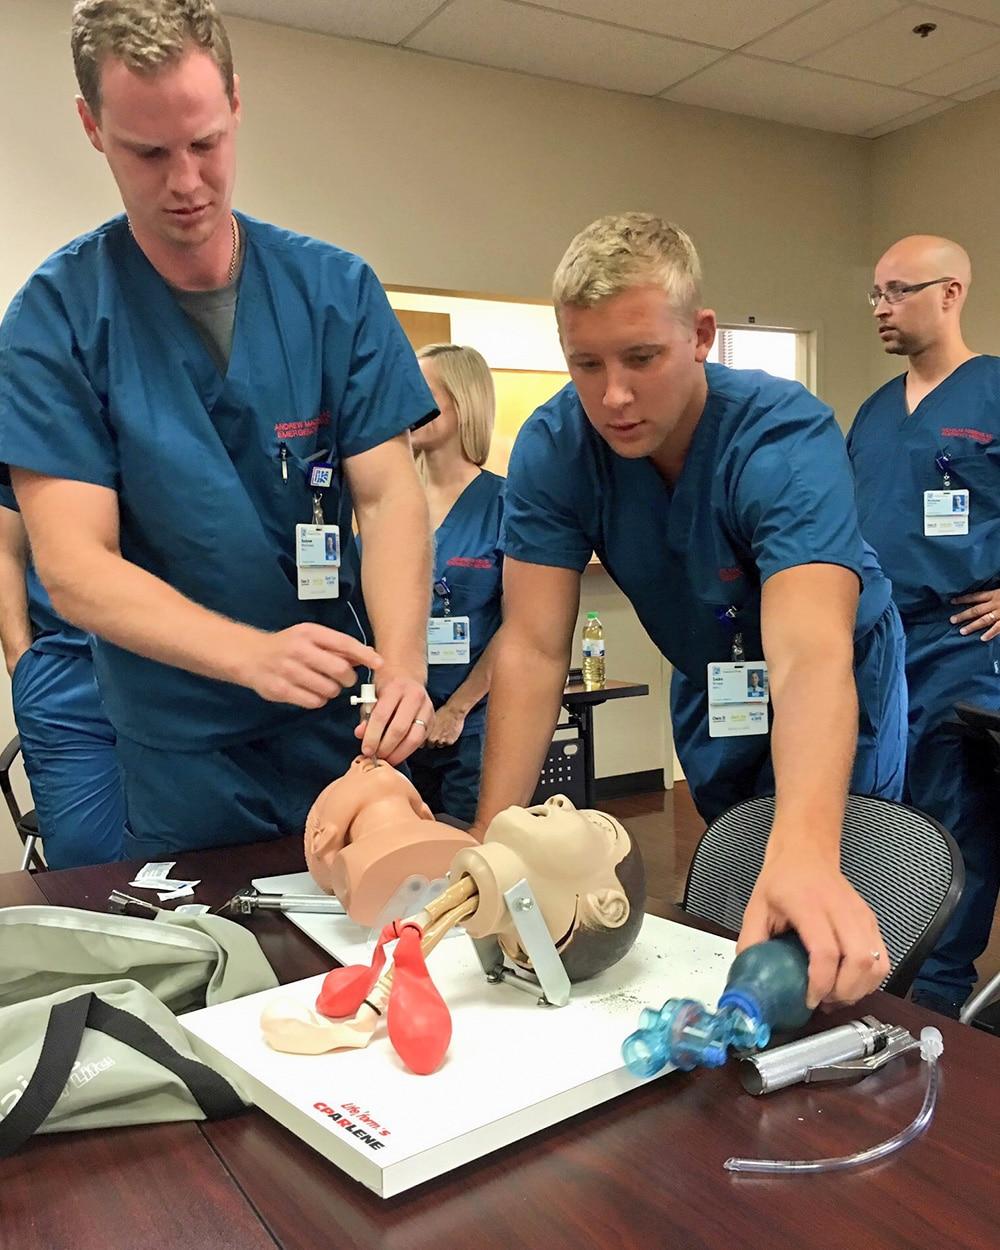 training curriculum vertical 4 - Fort Worth EM Residency Program